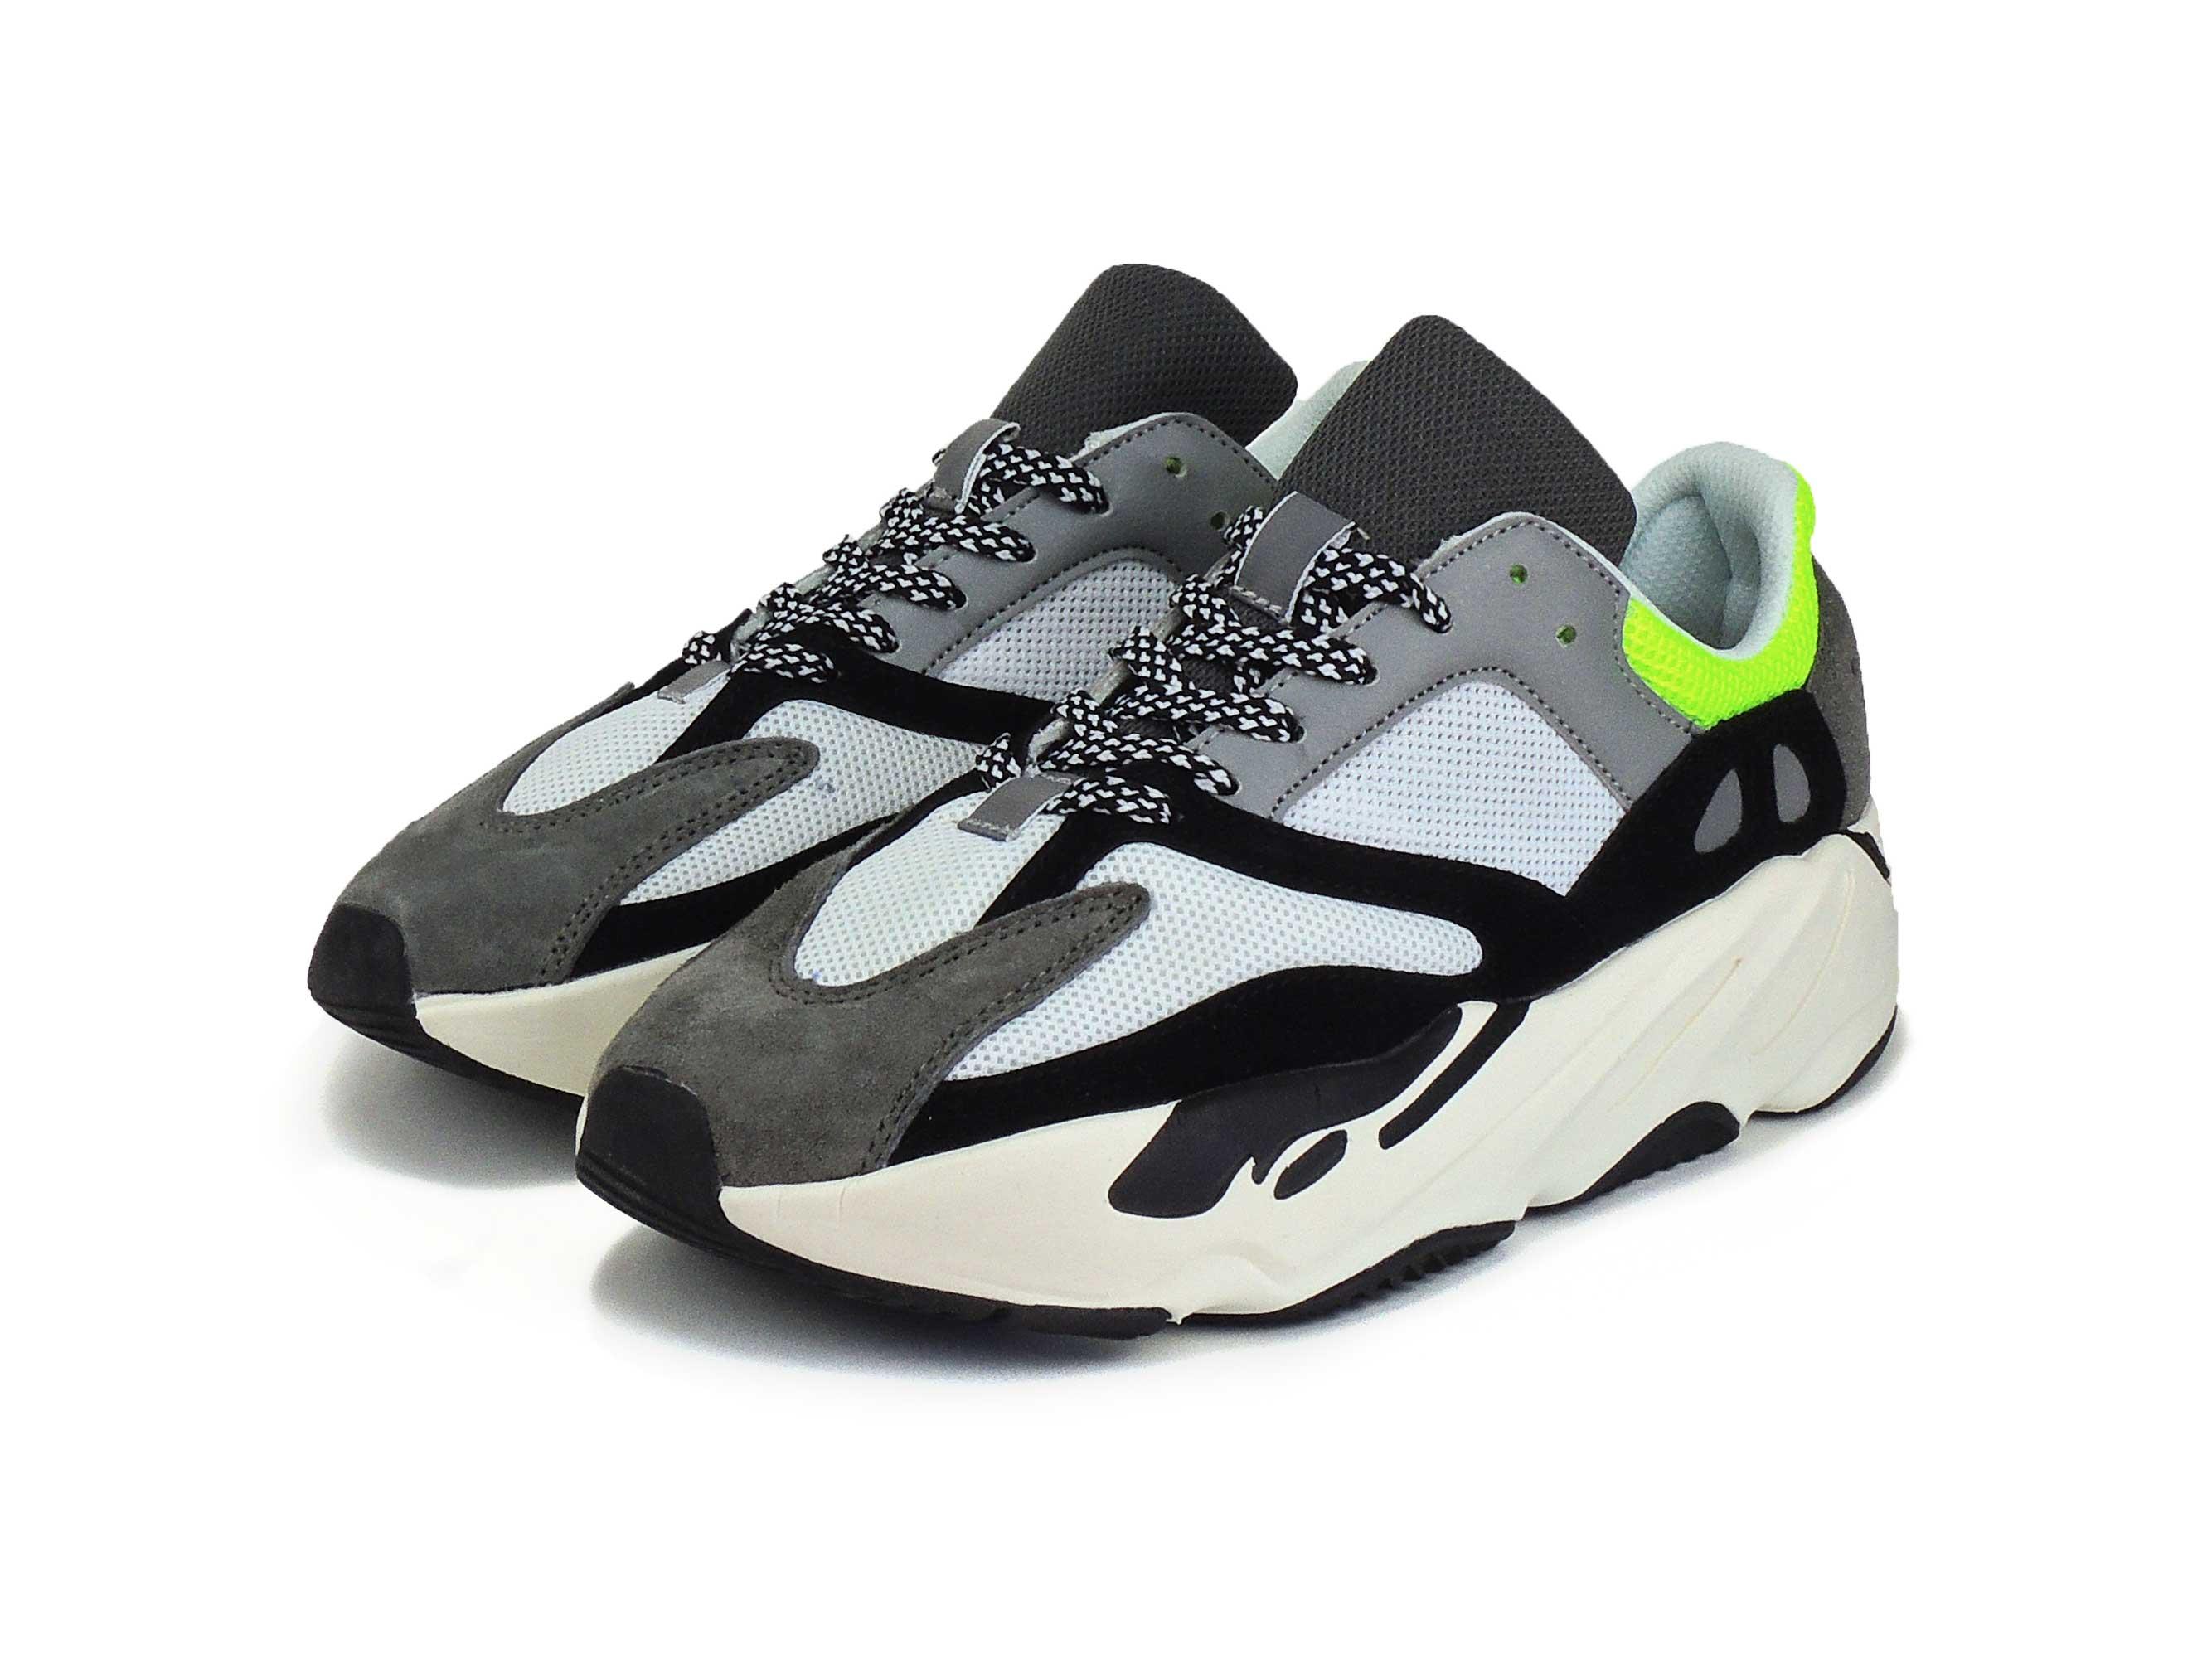 adidas yeezy 700 boost wave runner sand